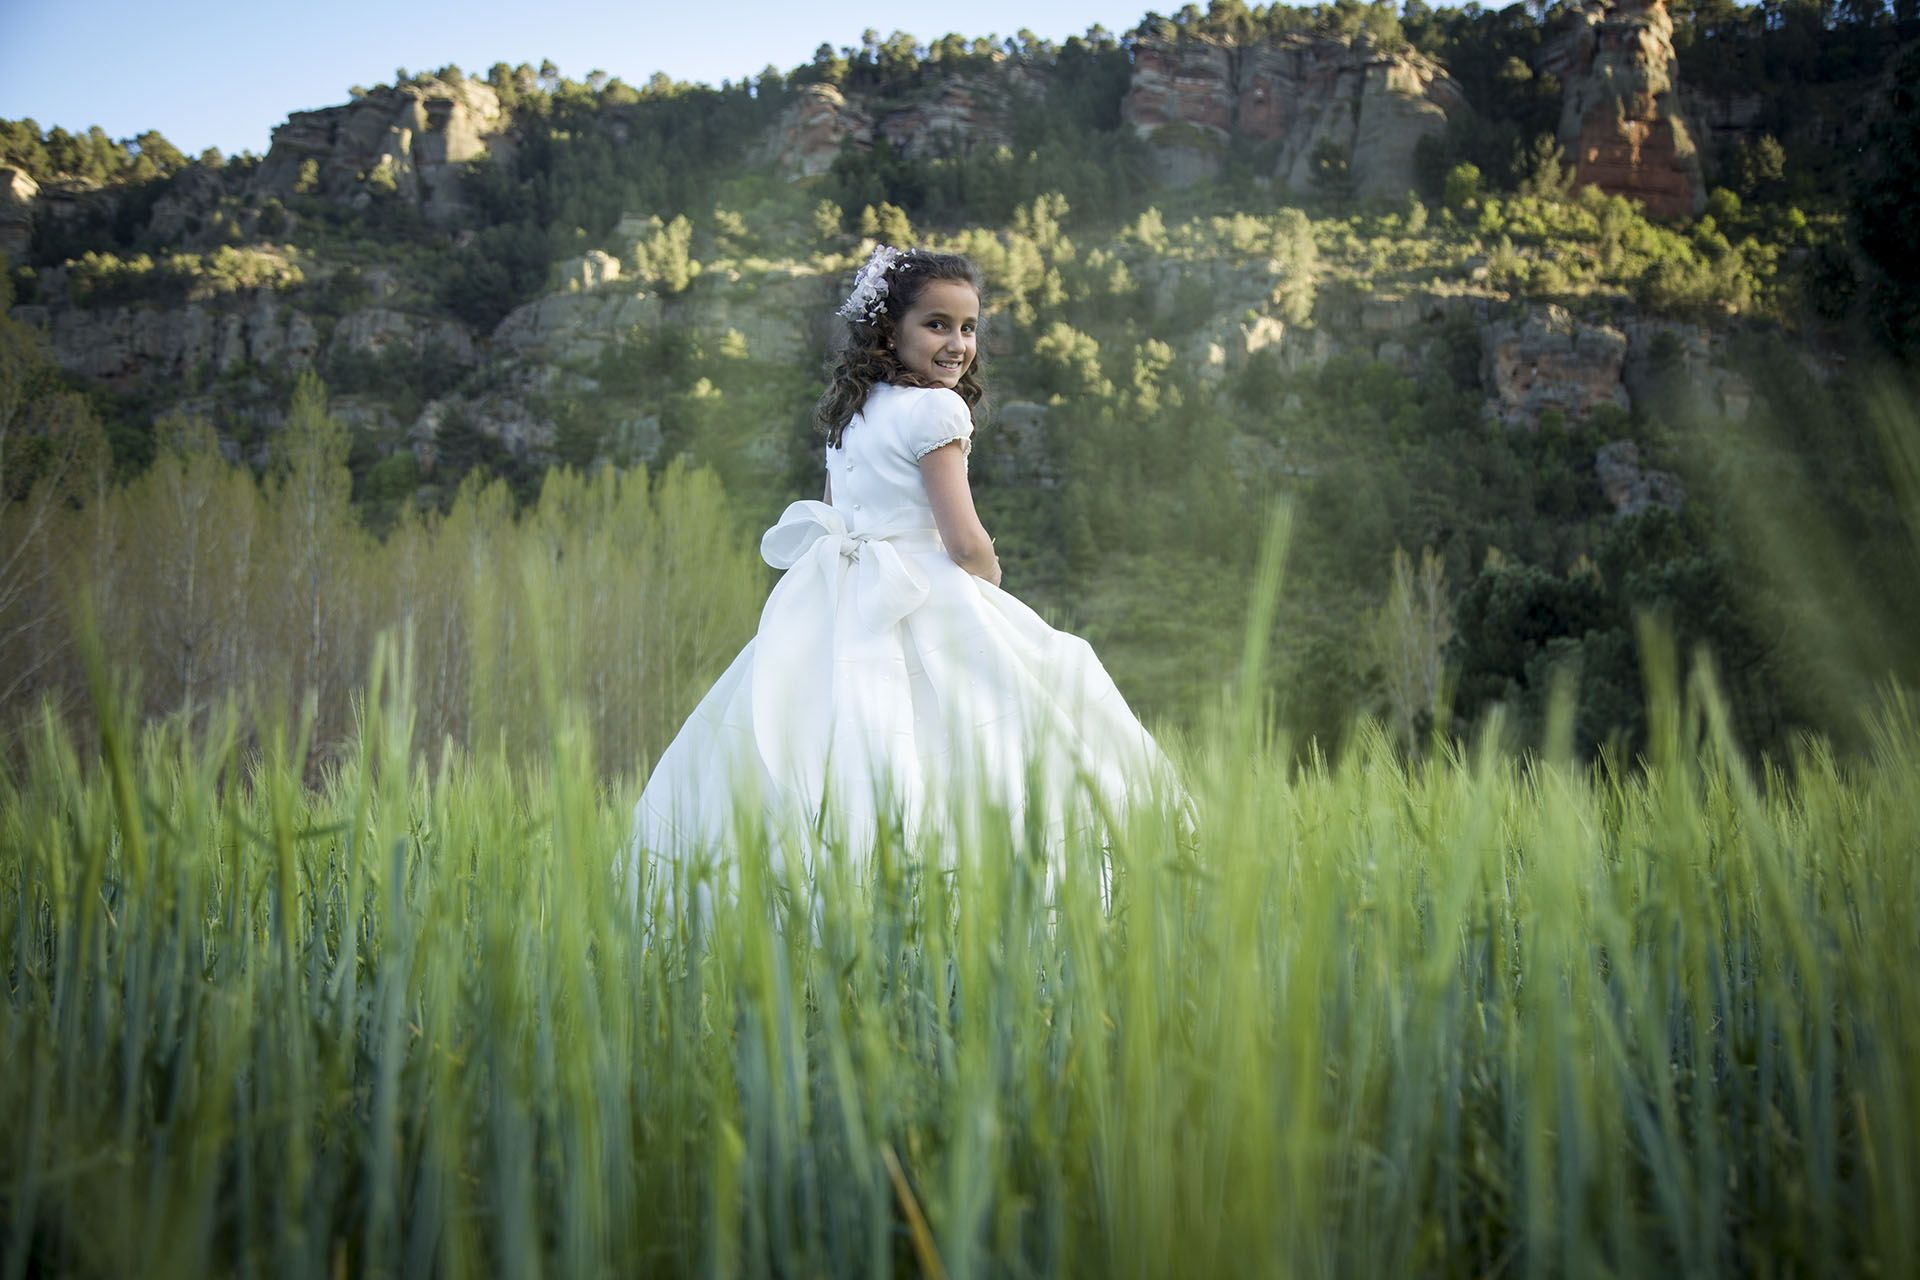 angela coronel-fotografia-comunion-molina de aragon-carmen busons